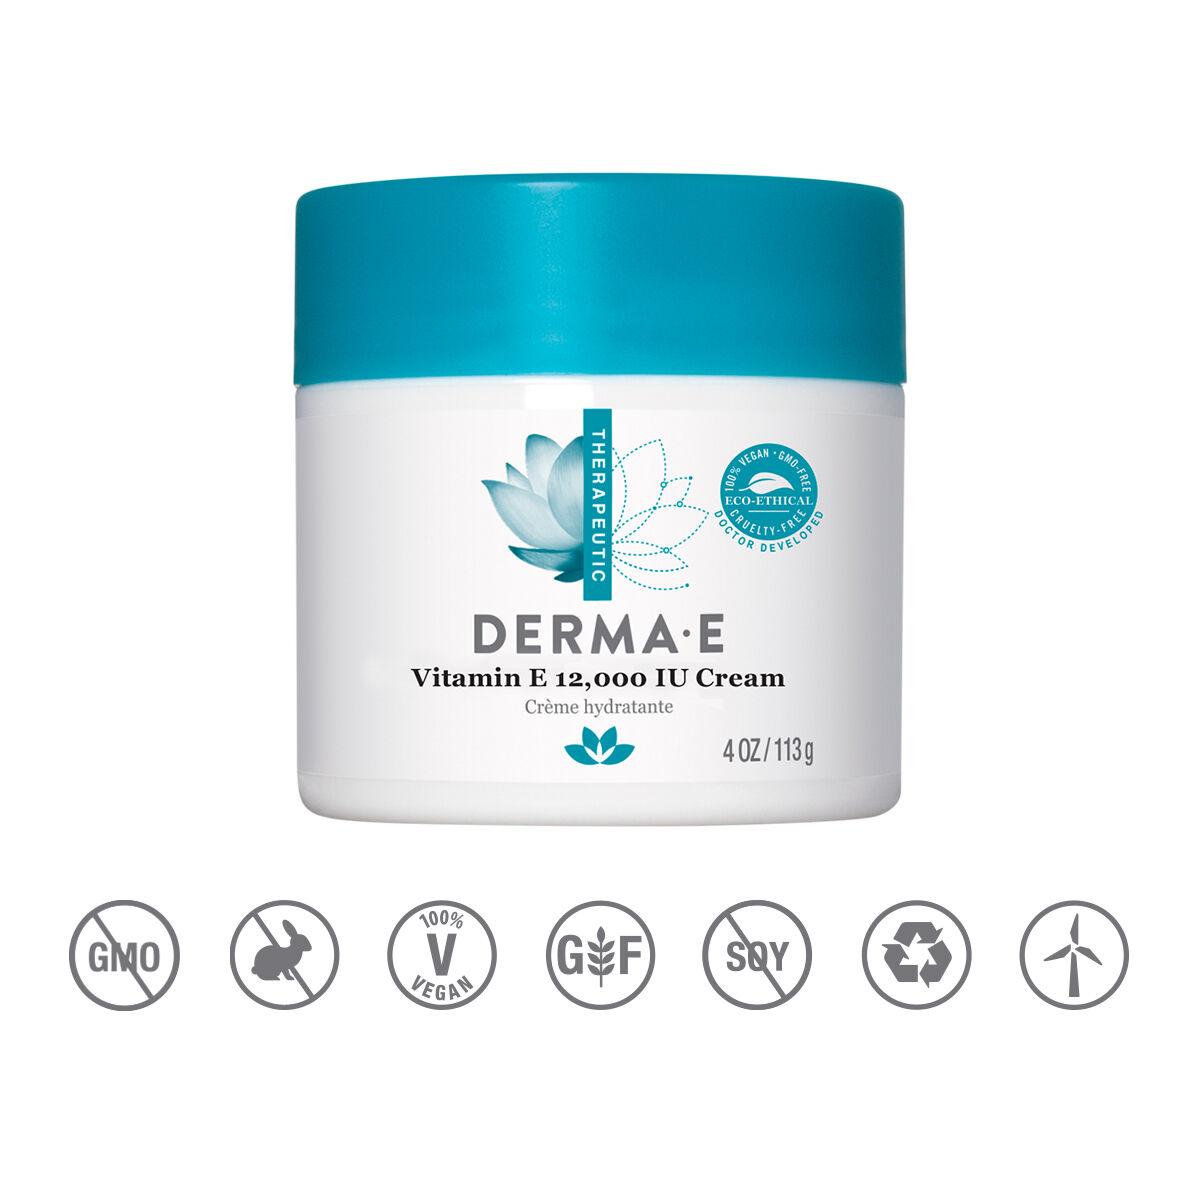 E Vitaminli Krem - 113 gr. Vitamin E 12,000 IU Crème